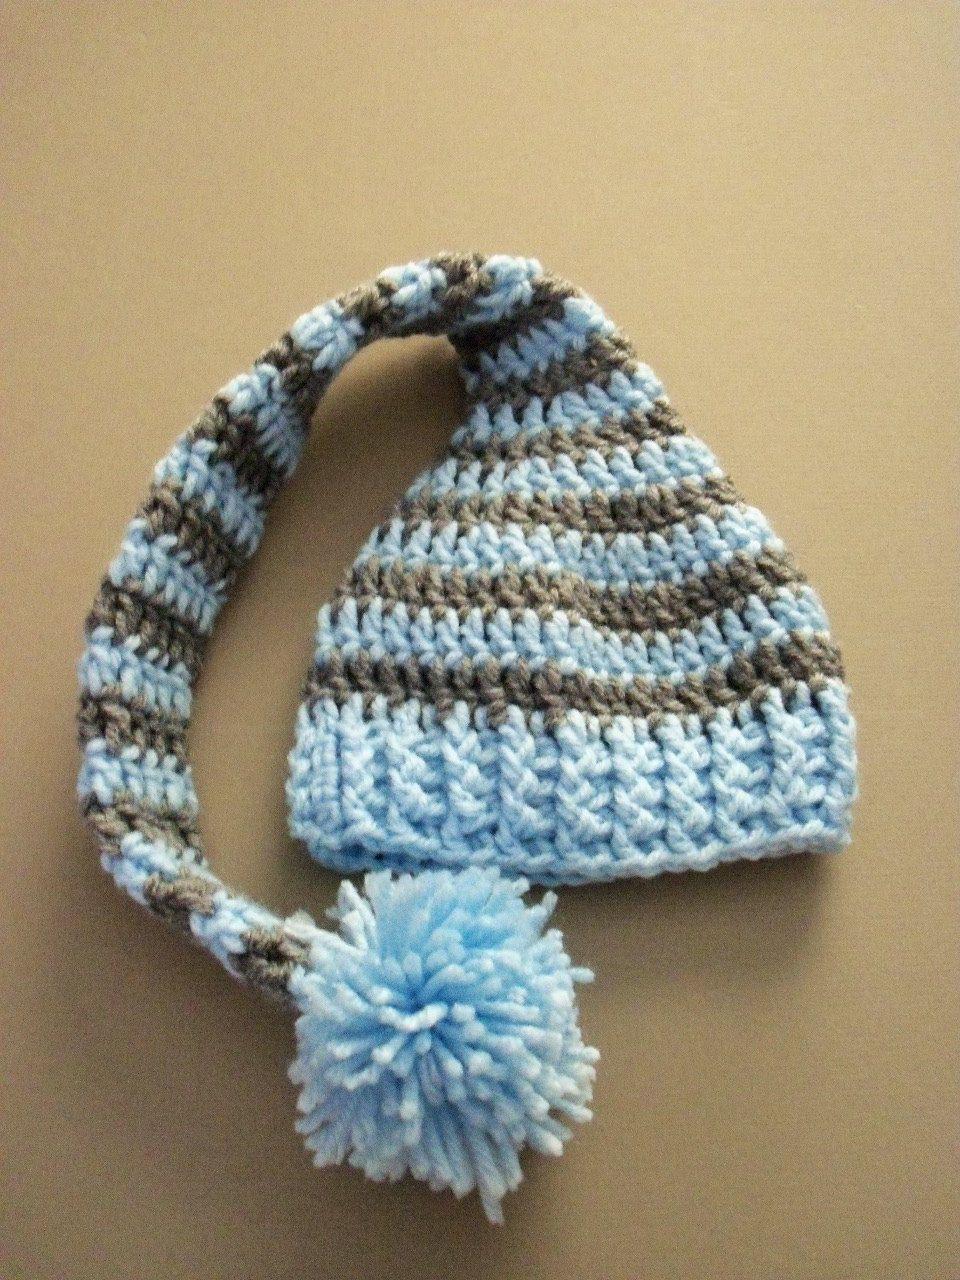 dd12a3bb8 Long Tail Elf Hat, Baby Elf Hat, Newborn Hat | Baby | Crochet baby ...